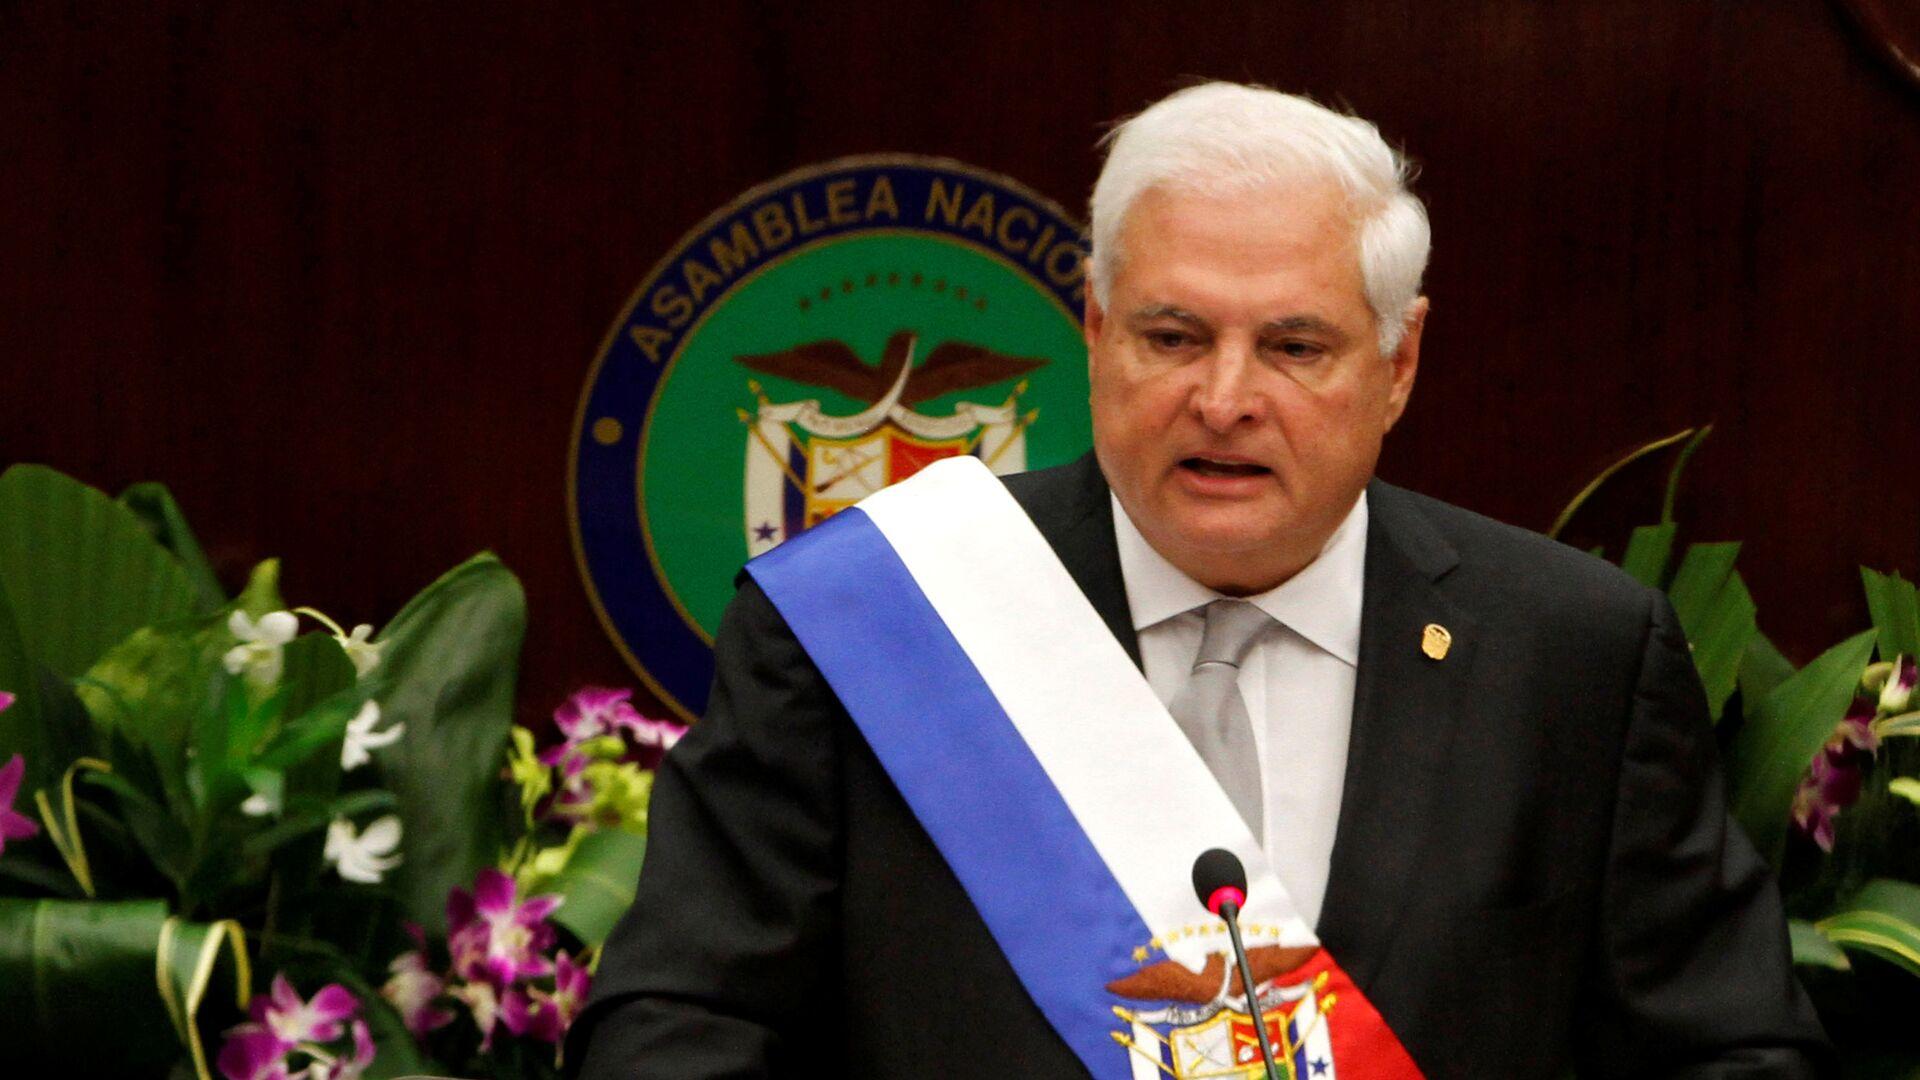 Ricardo Martinelli, expresidente de Panamá - Sputnik Mundo, 1920, 24.09.2021